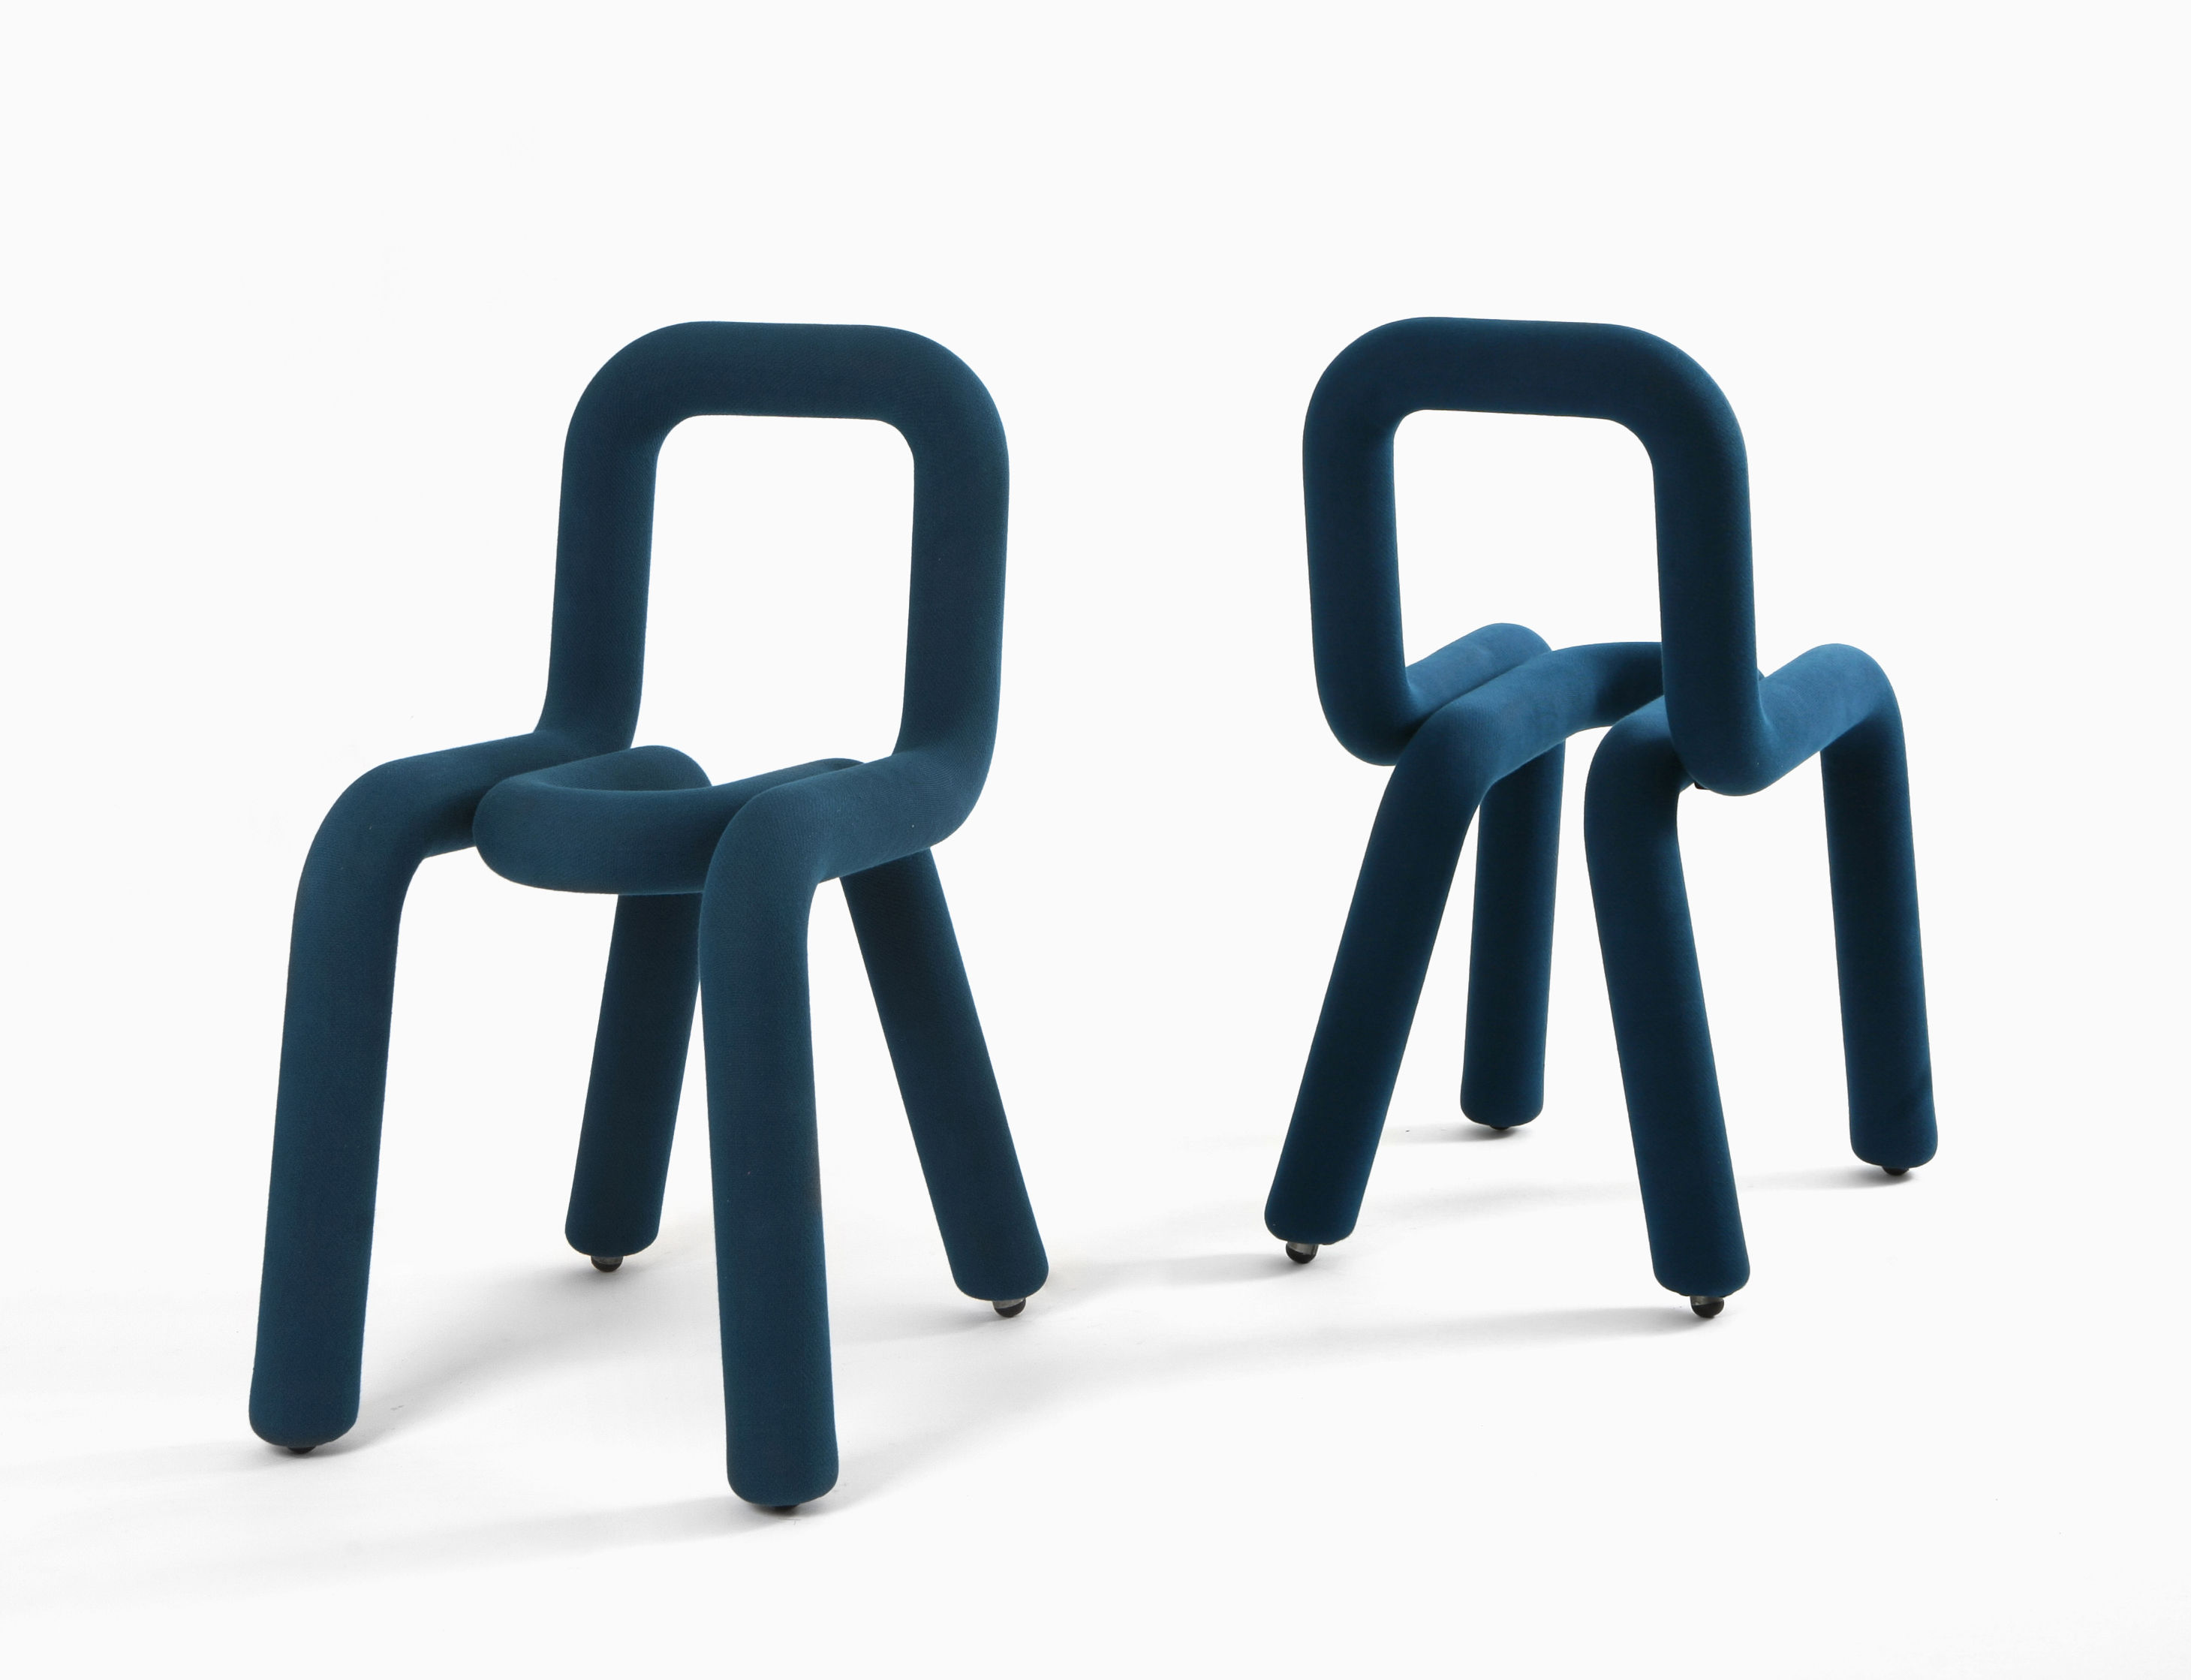 Sedia Imbottita Design : Bold sedia imbottita tessuto blu anatra by moustache made in